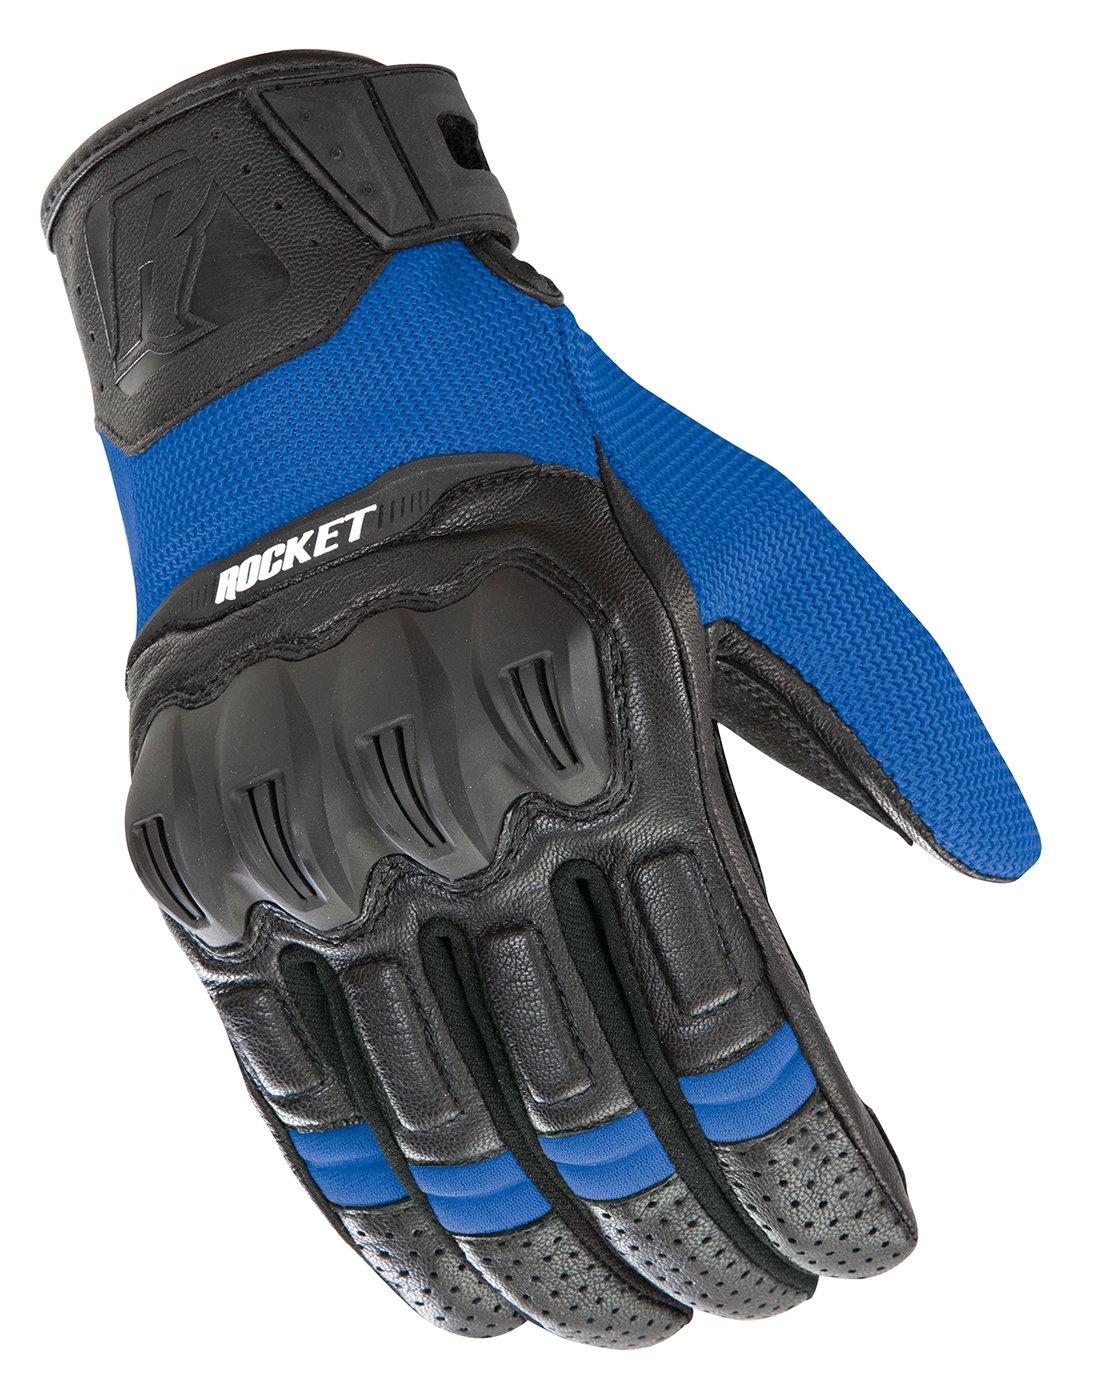 Joe Rocket Mens Phoenix 5.1 Hybrid Motorcycle Glove Black, Small